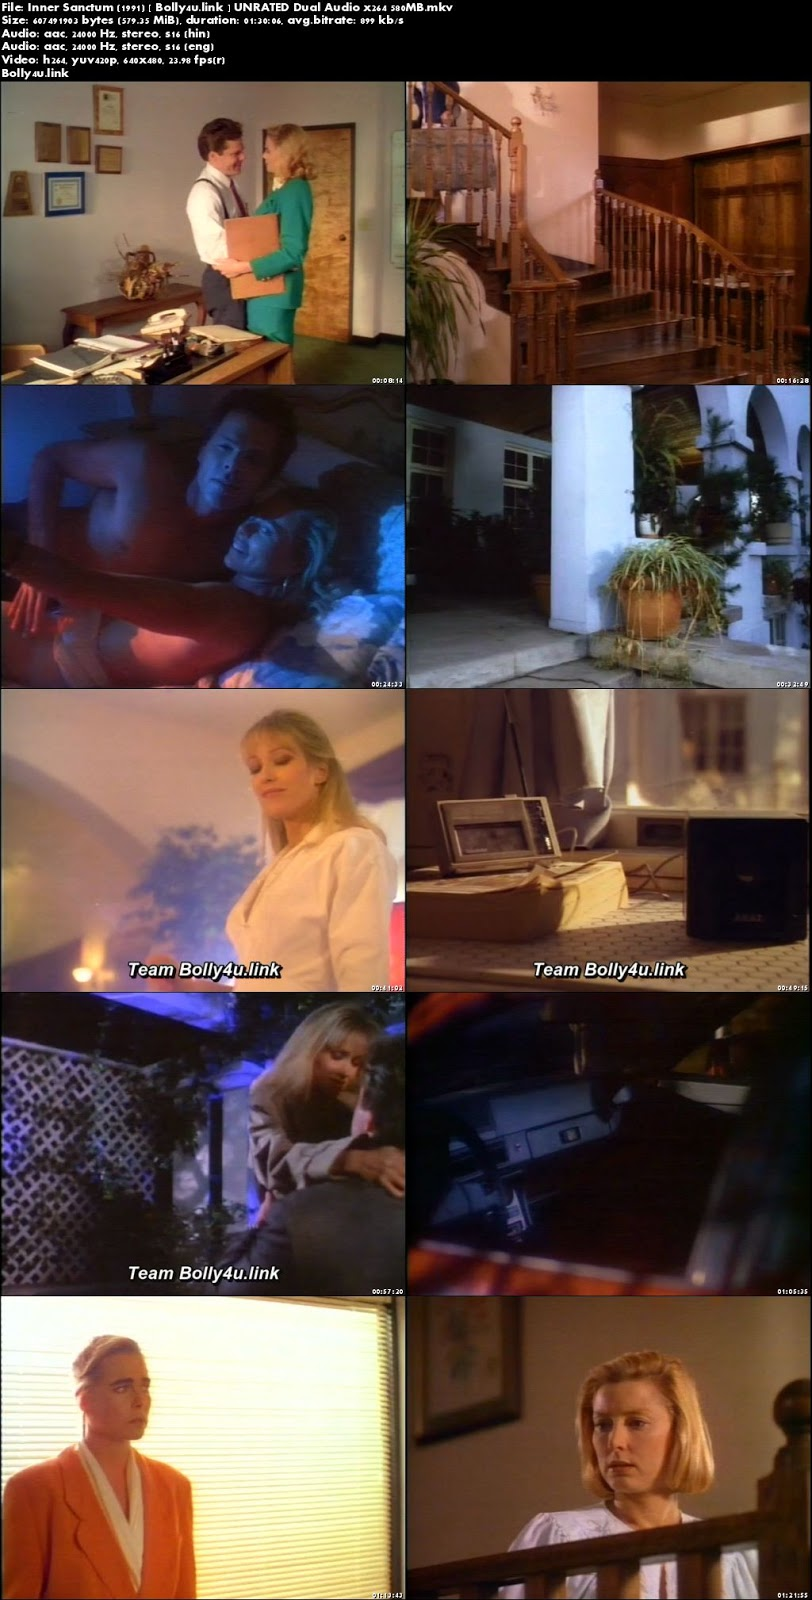 [18+] Inner Sanctum 1991 DVDRip 550MB UNRATED Hindi Dual Audio x264 Download